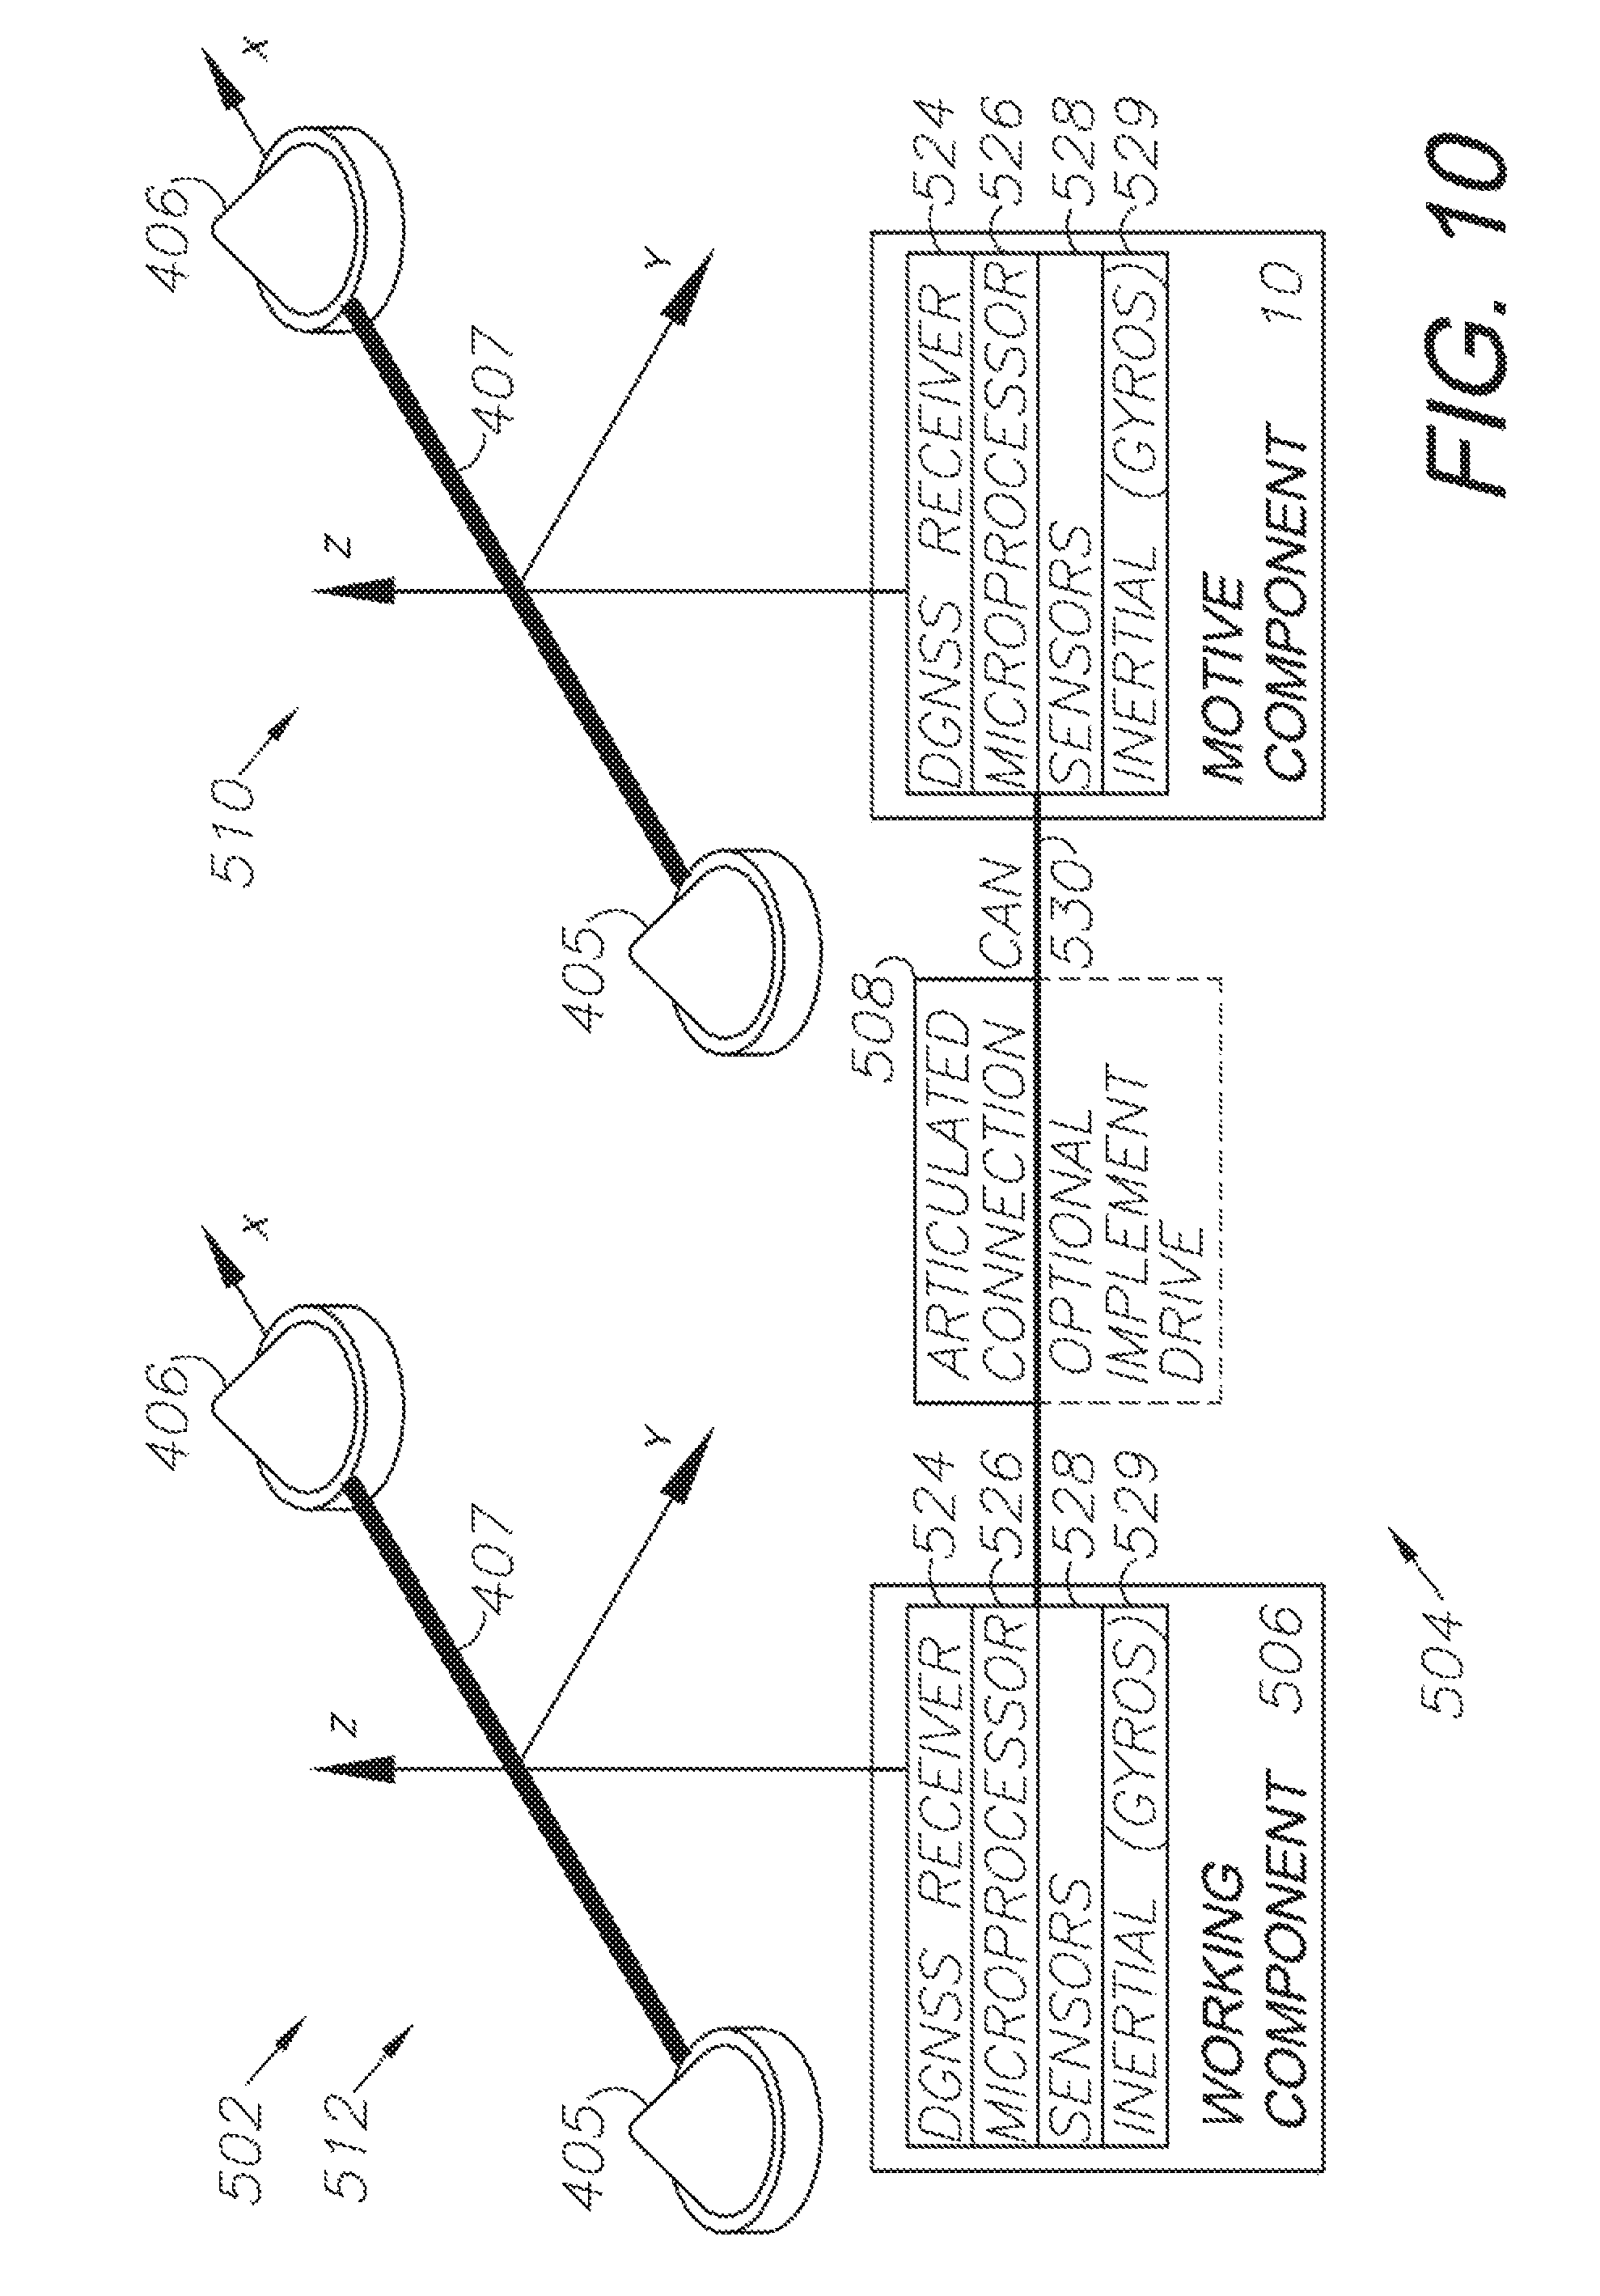 Patent US 9,886,038 B2 on